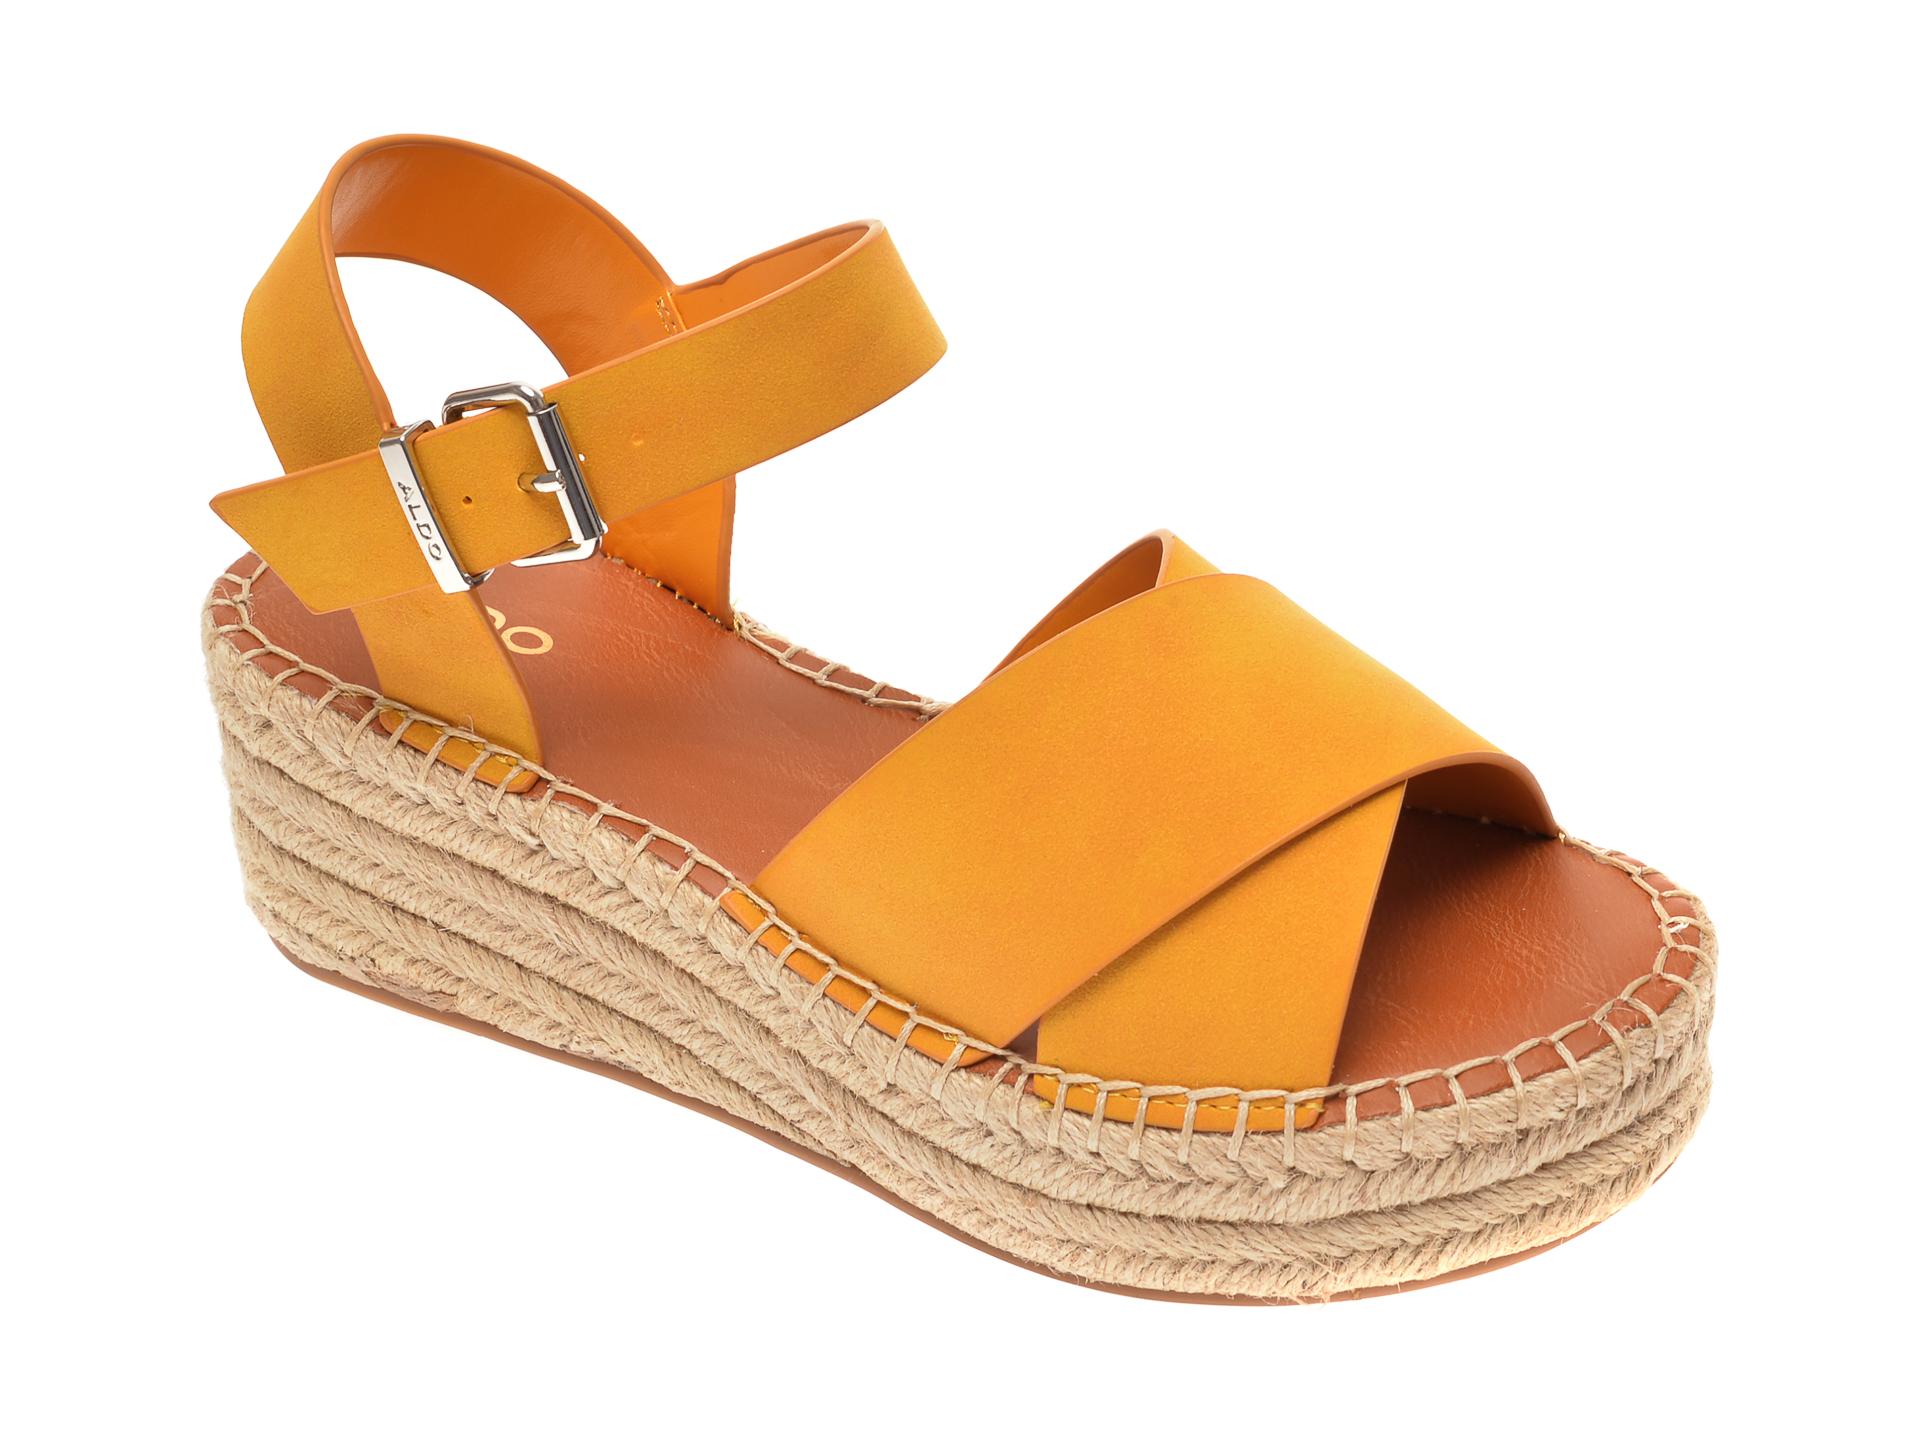 Sandale ALDO galbene, Tineviel700, din piele ecologica